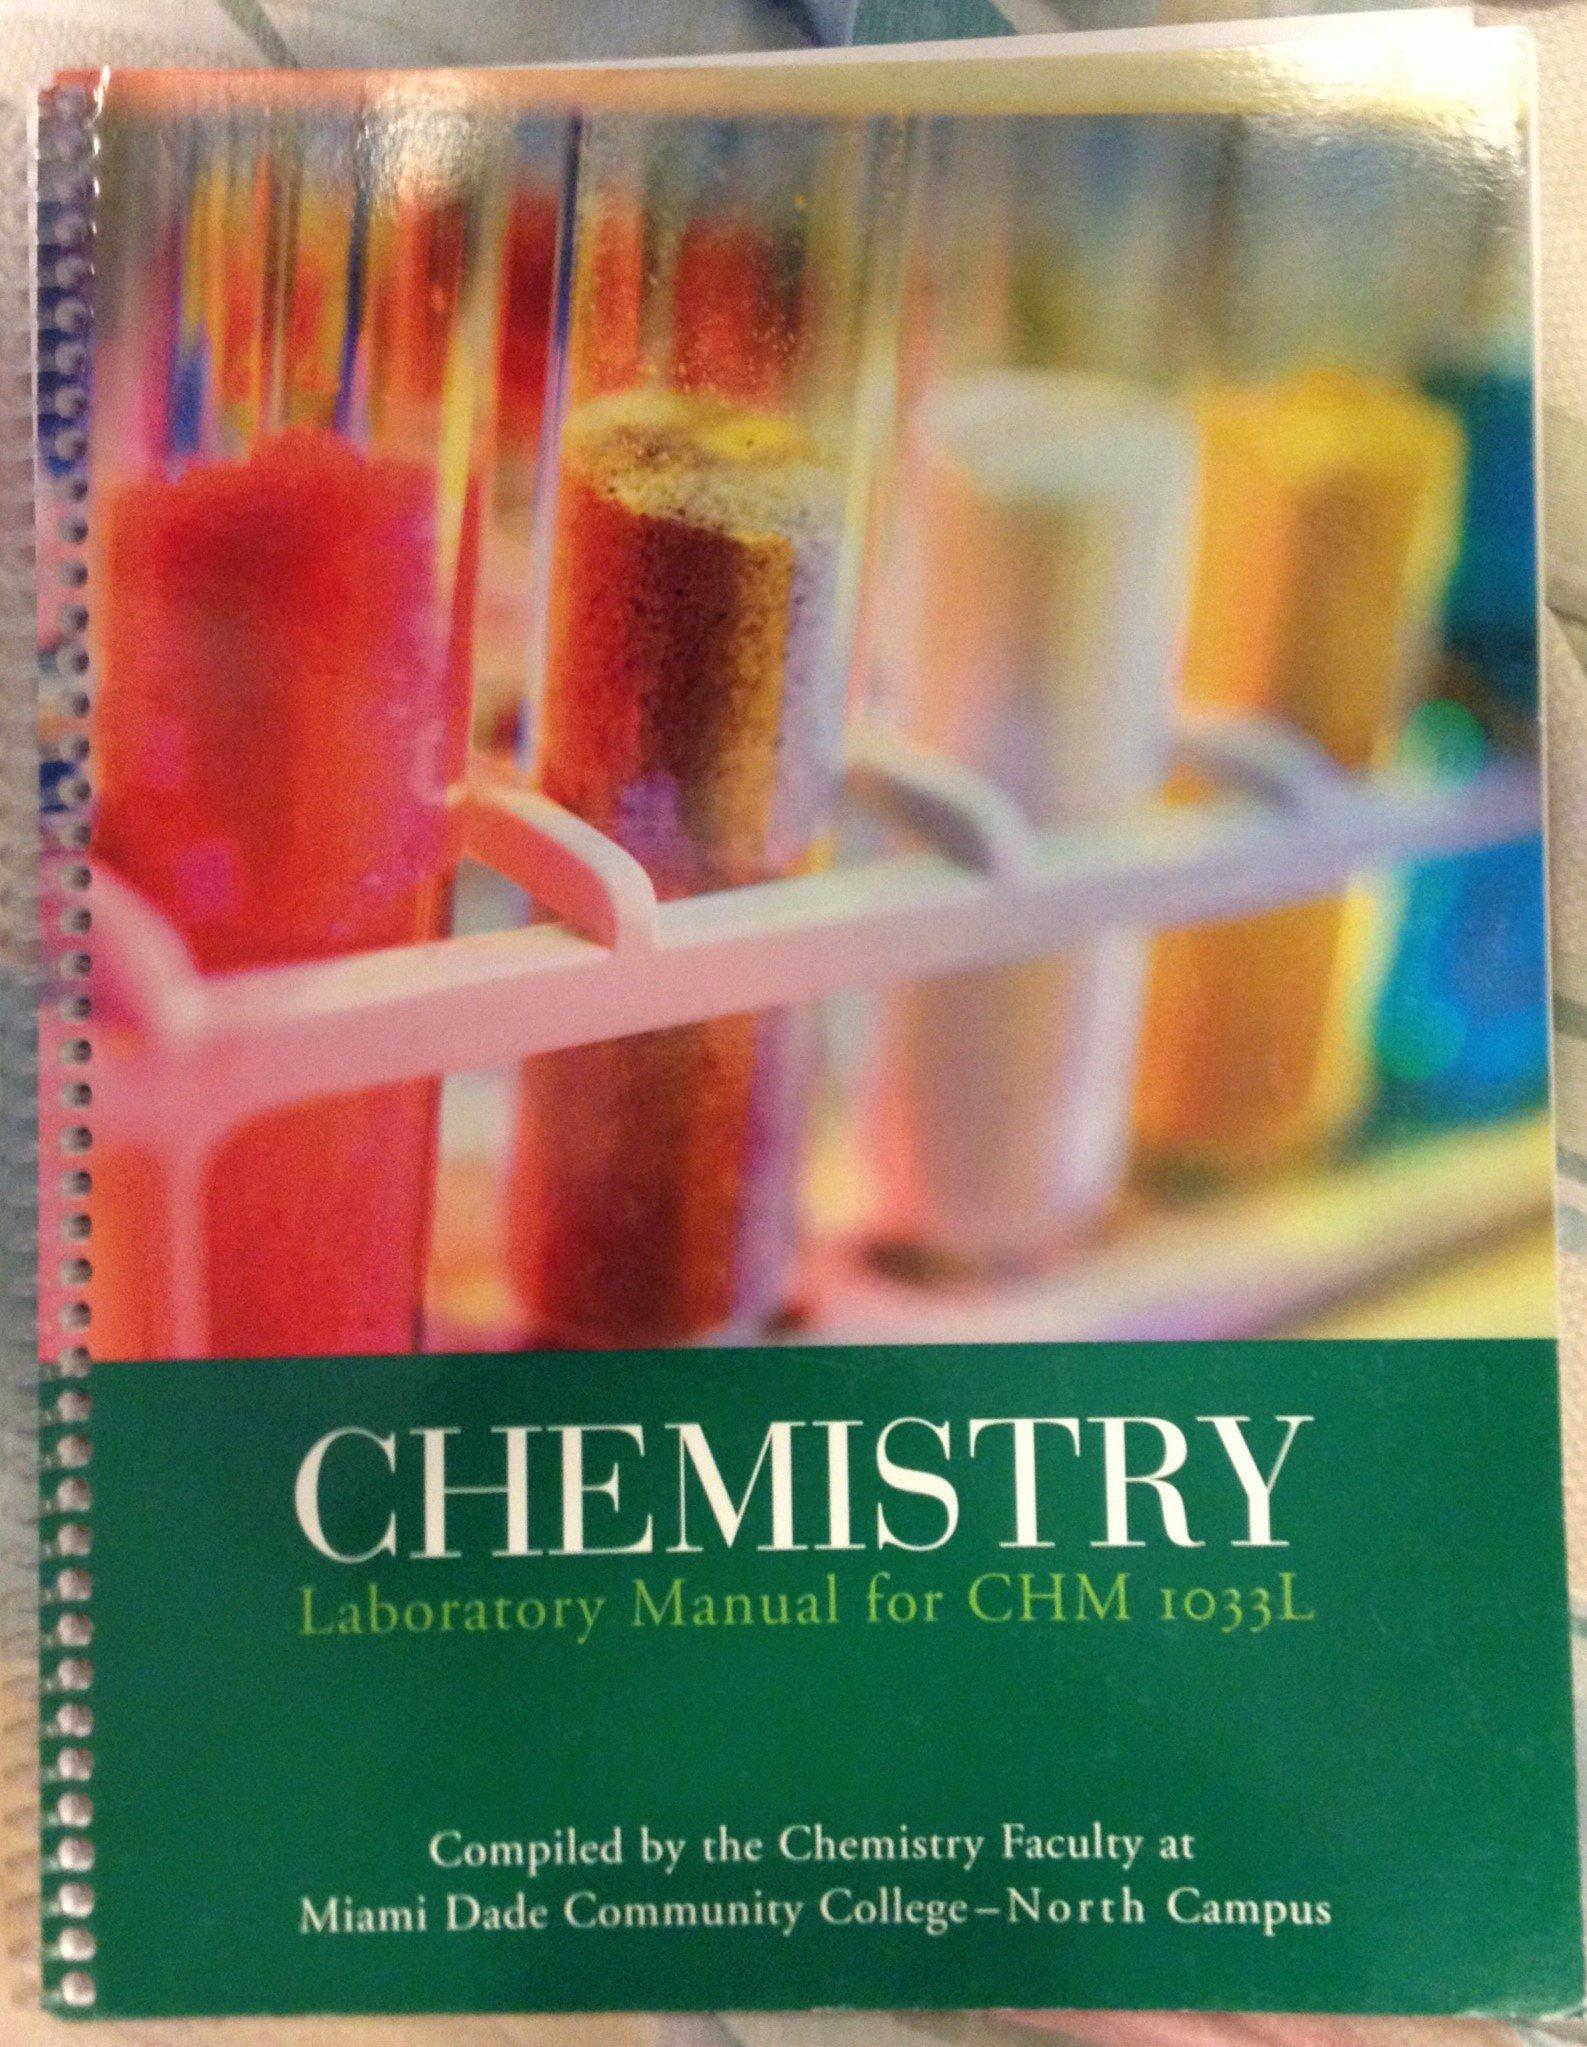 Chemistry Laboratory Manual for CHM 1033L (MDC Edition): 9780536726667:  Amazon.com: Books